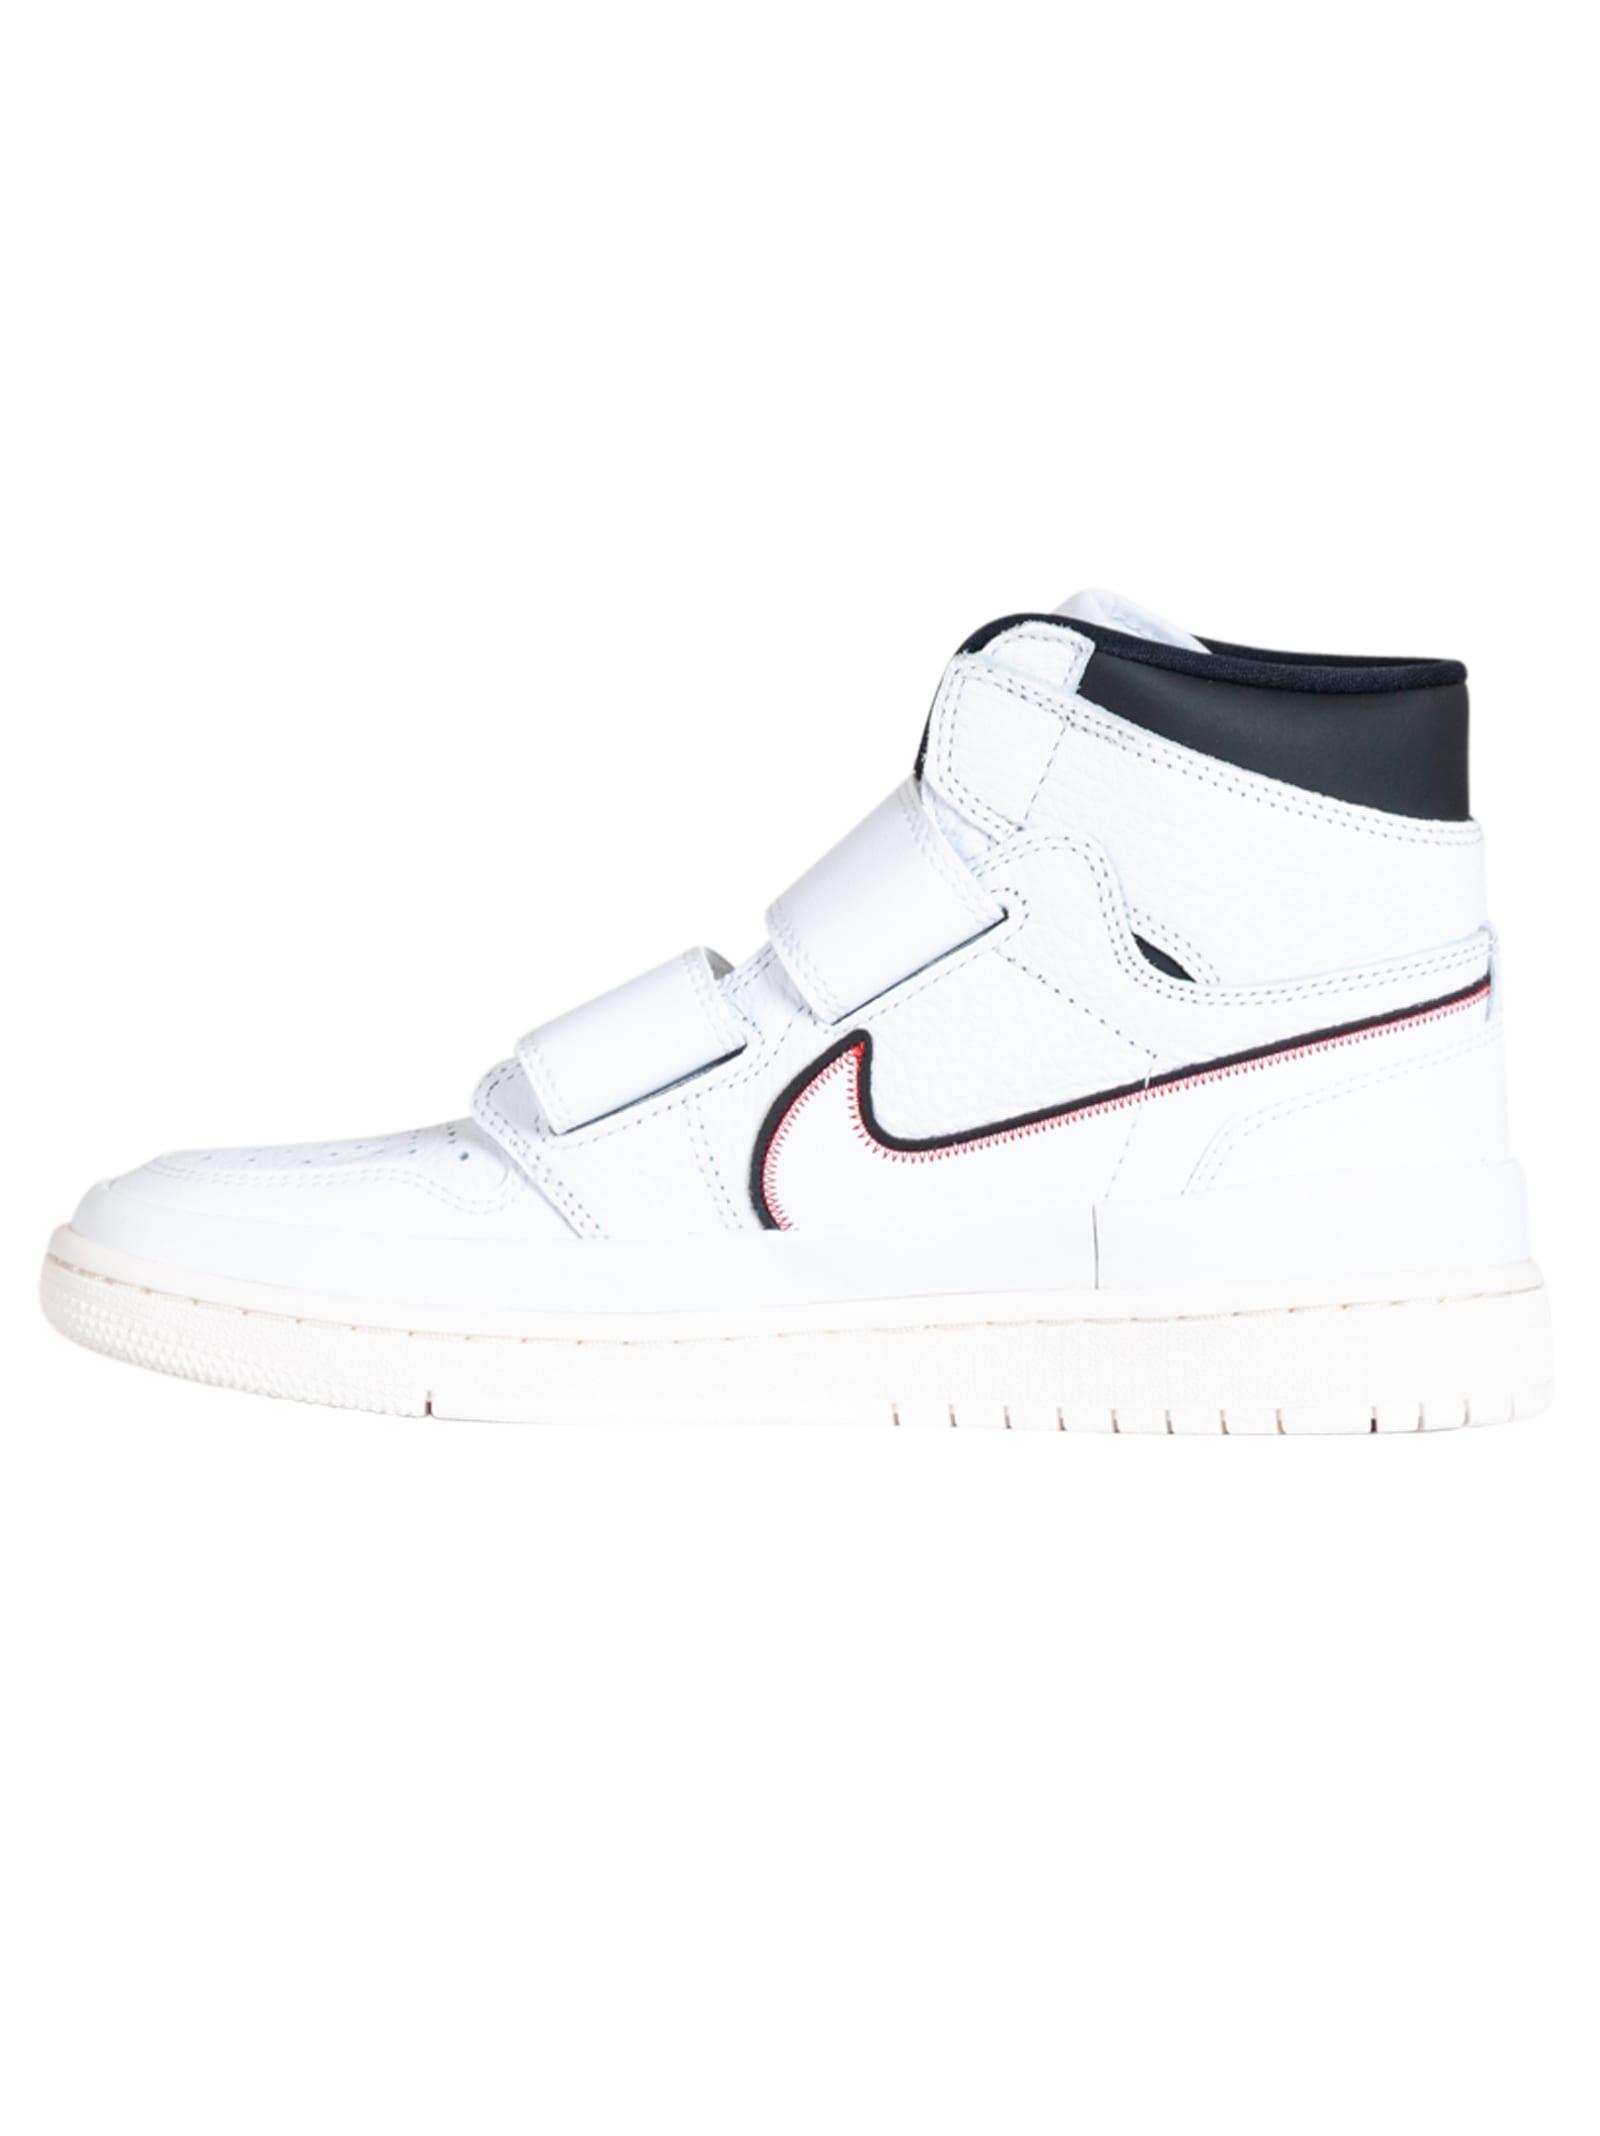 Nike Air Jordan 1 Re Hi Double Strp Whitewhite black sail